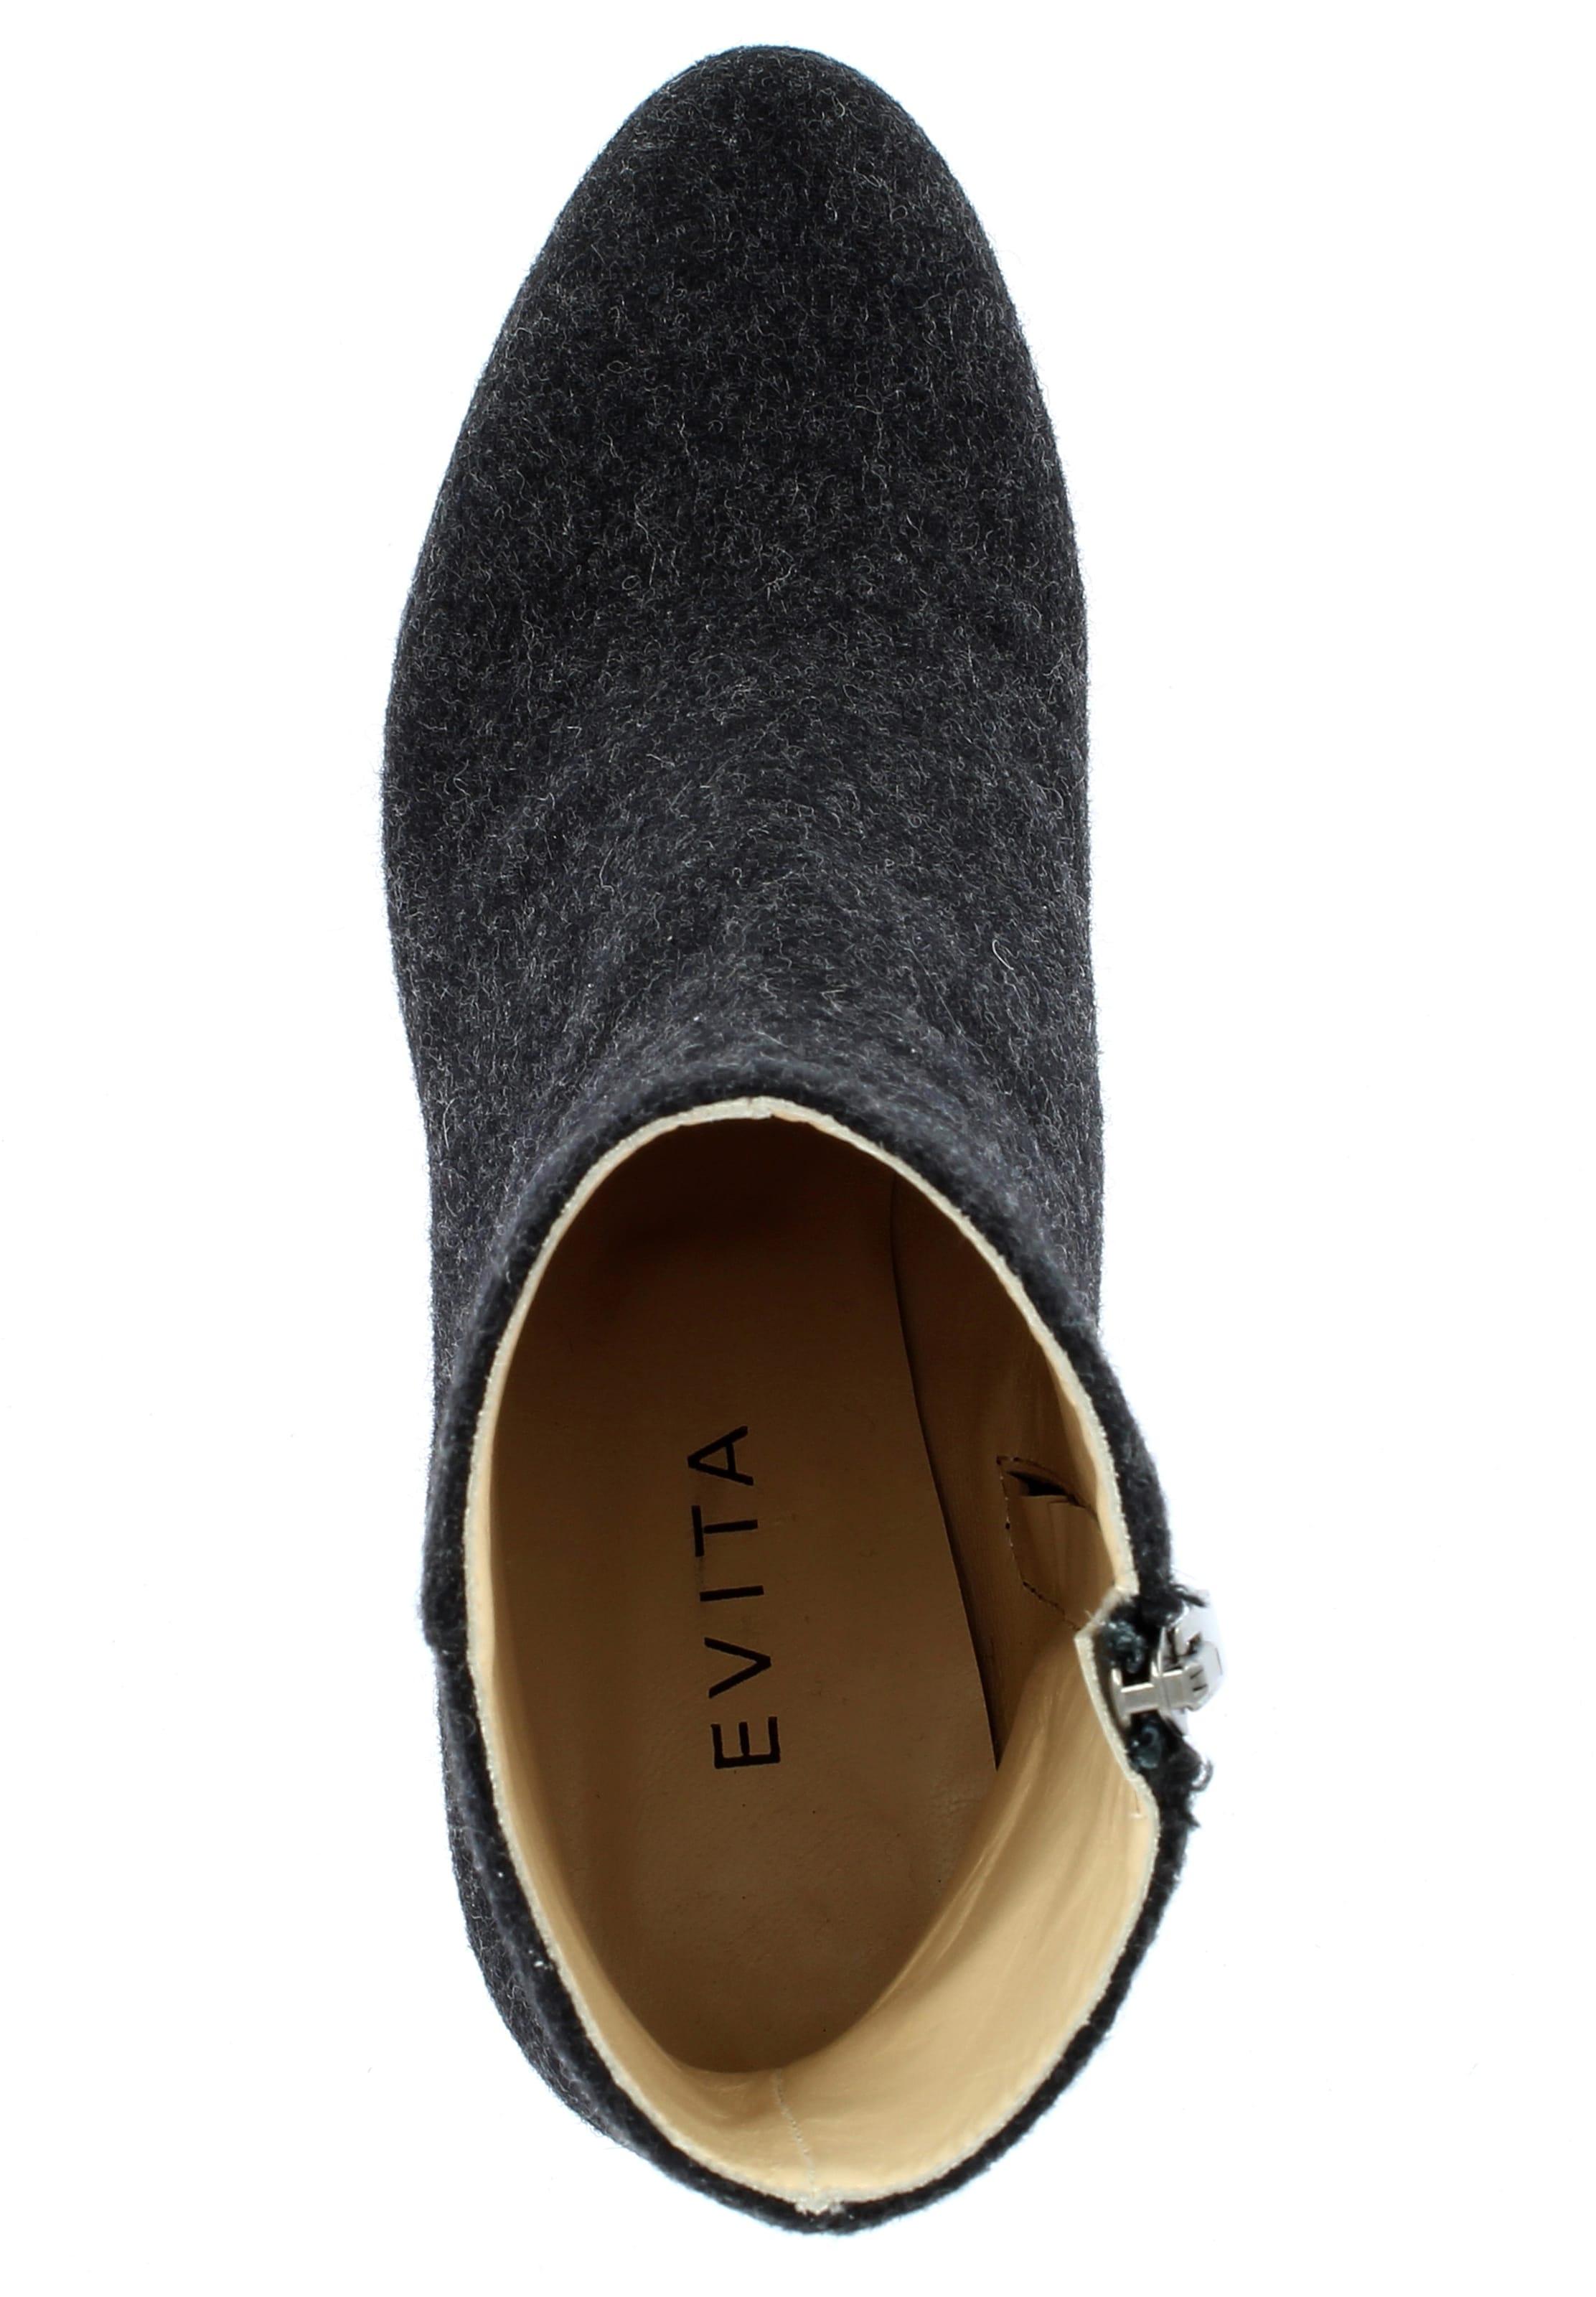 En Evita Evita Bottines Bottines Noir rCedBox